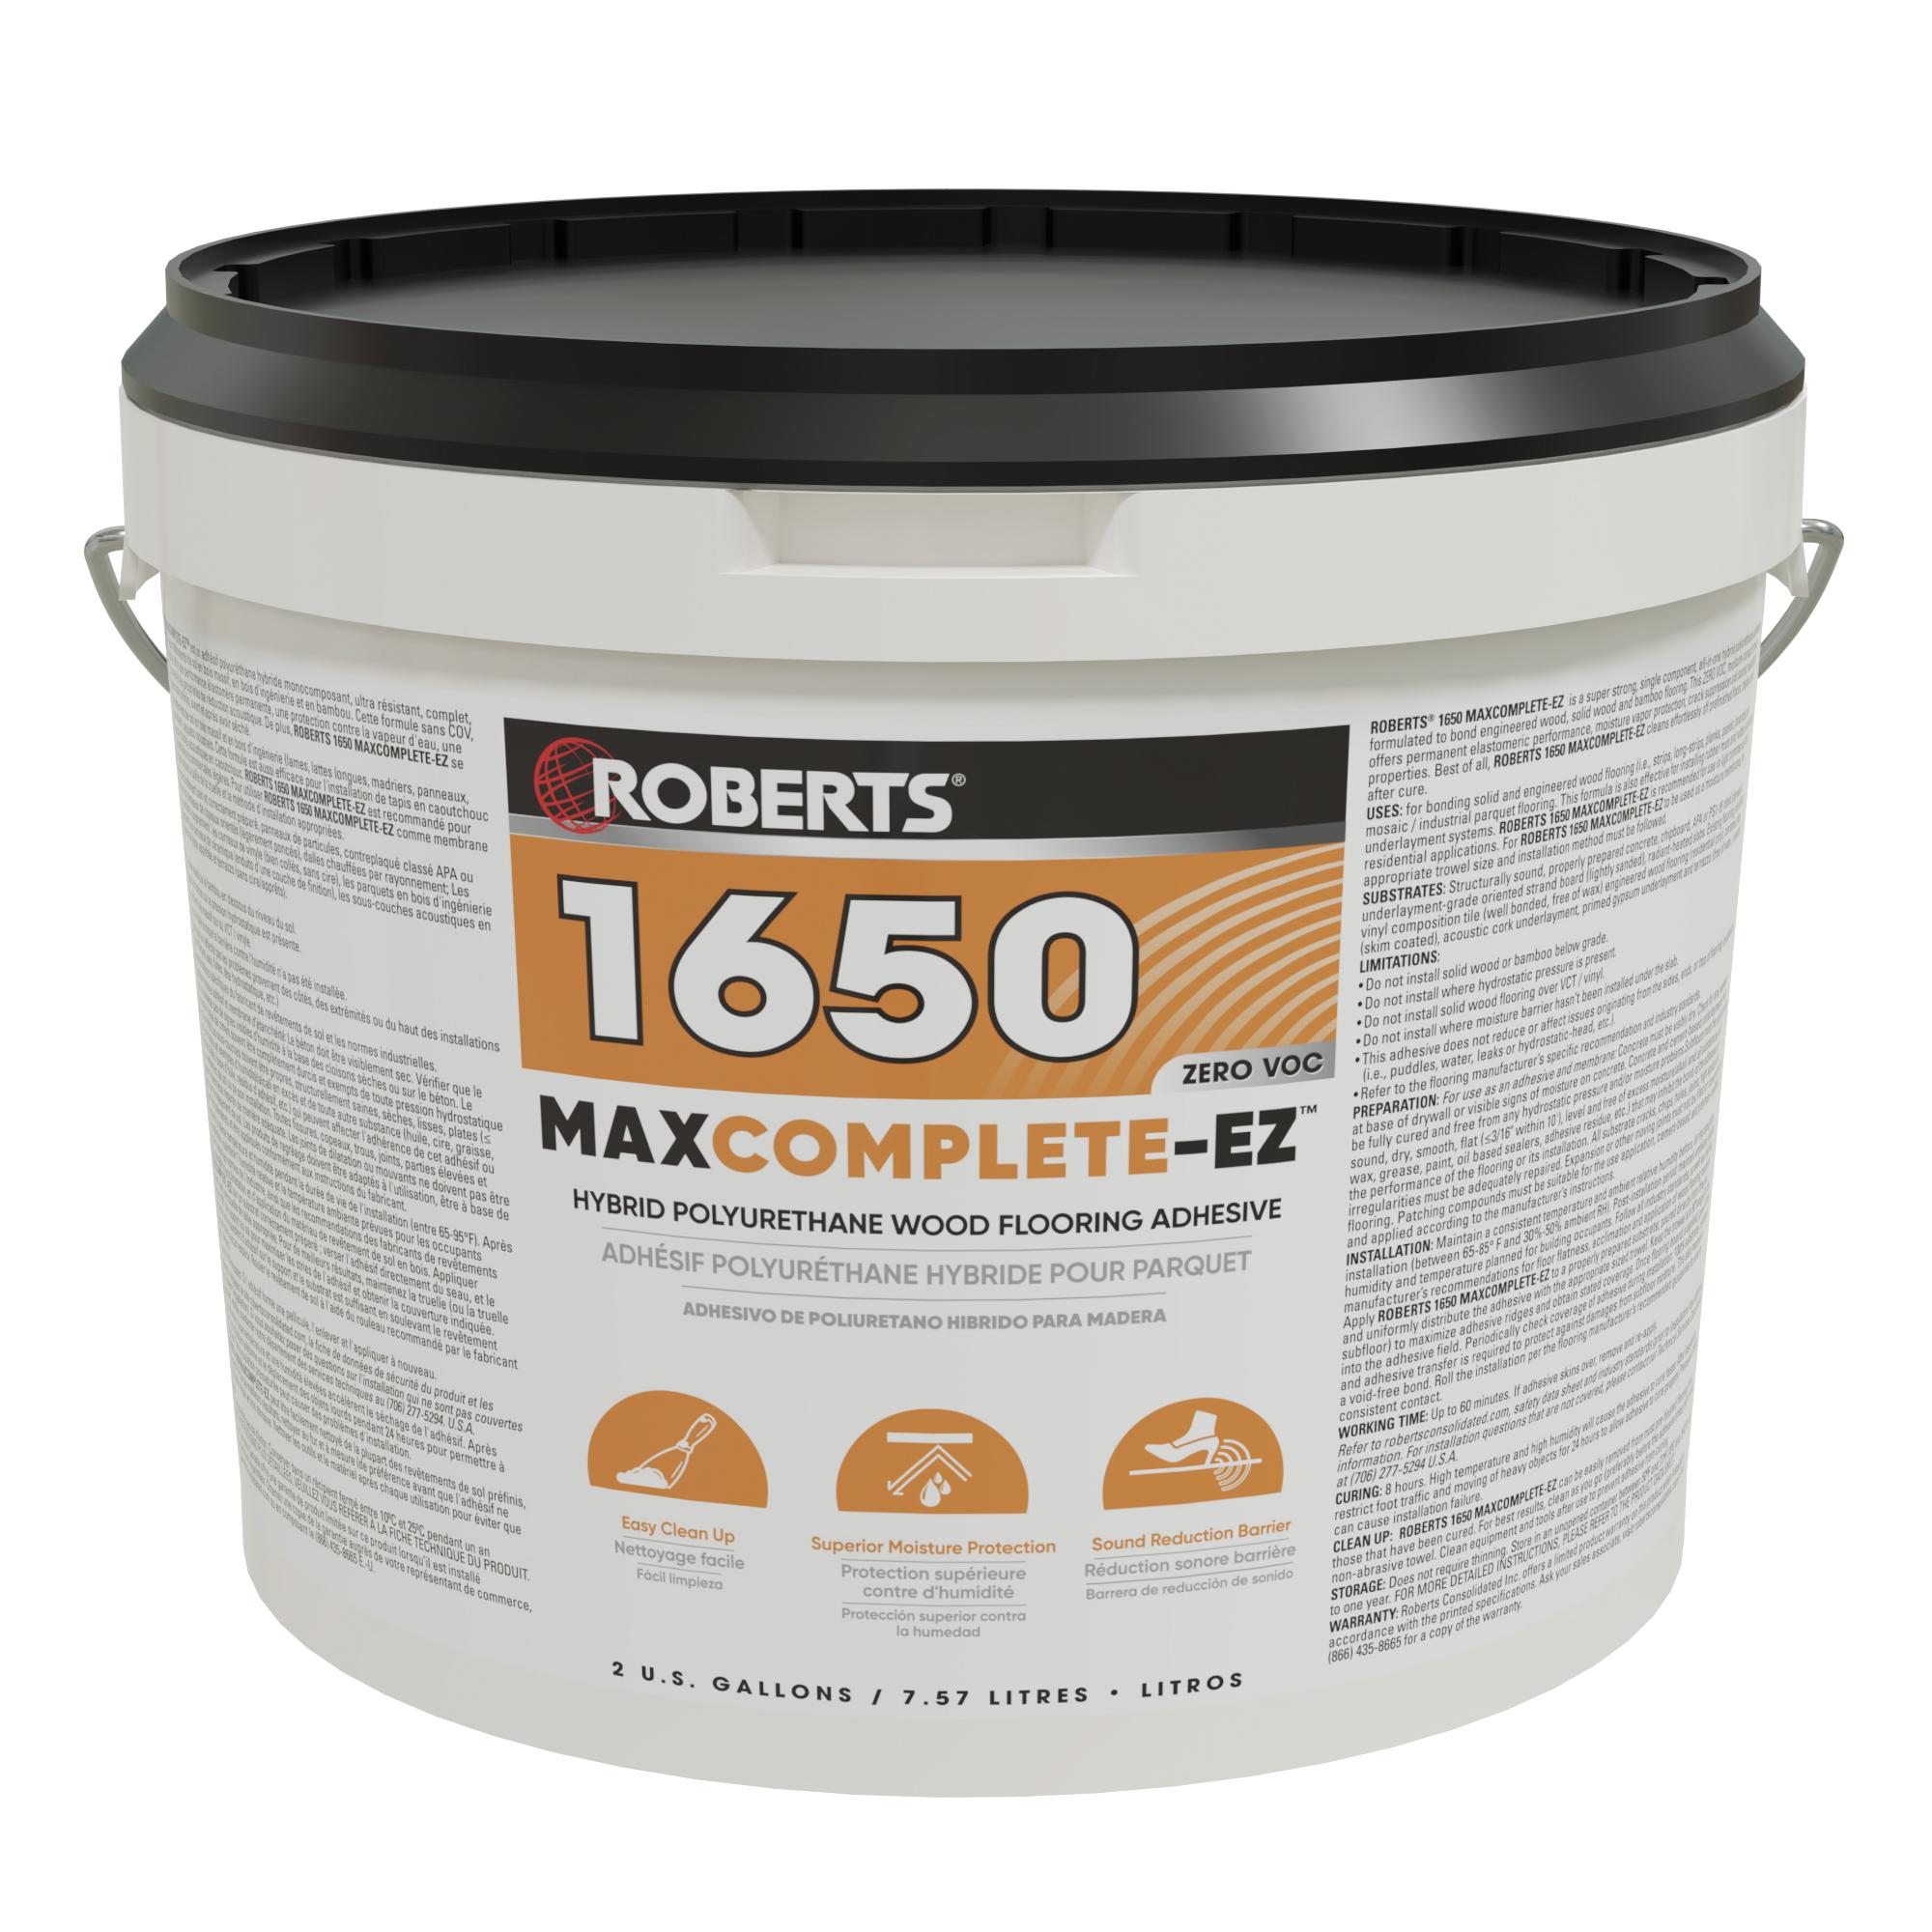 MAXCOMPLETE-EZ Polyurethane Wood Flooring Adhesive